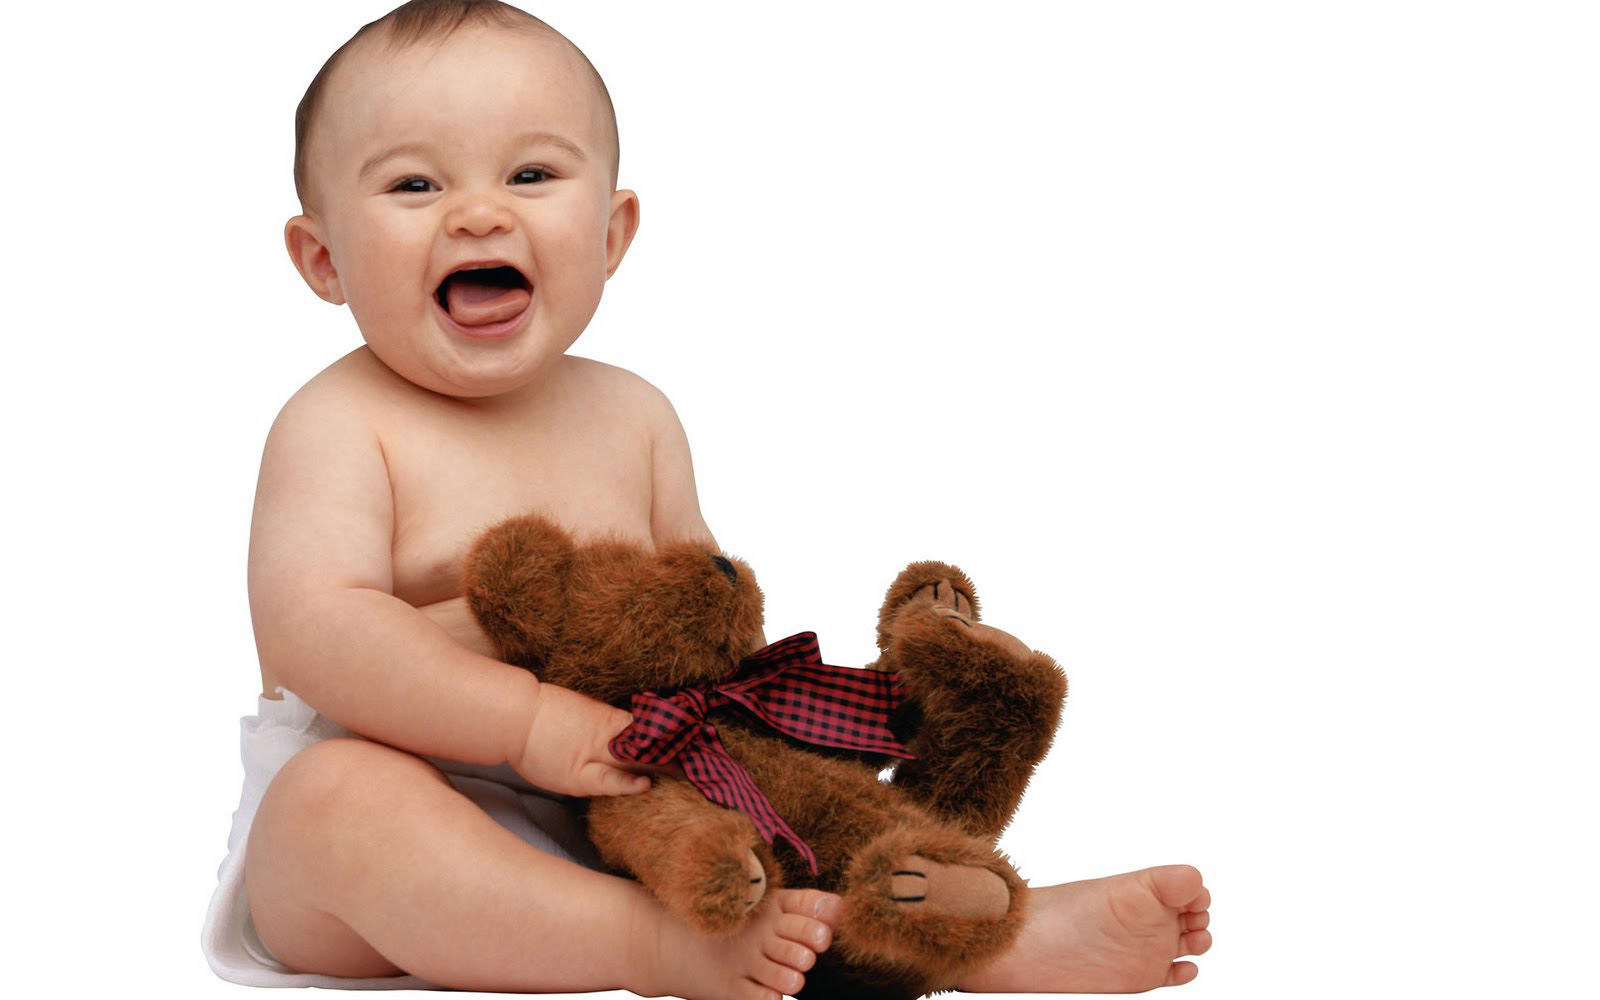 Sweet cute babies smile desktop wallpapers hd free sweet cute babies smile desktop wallpapers hd voltagebd Image collections